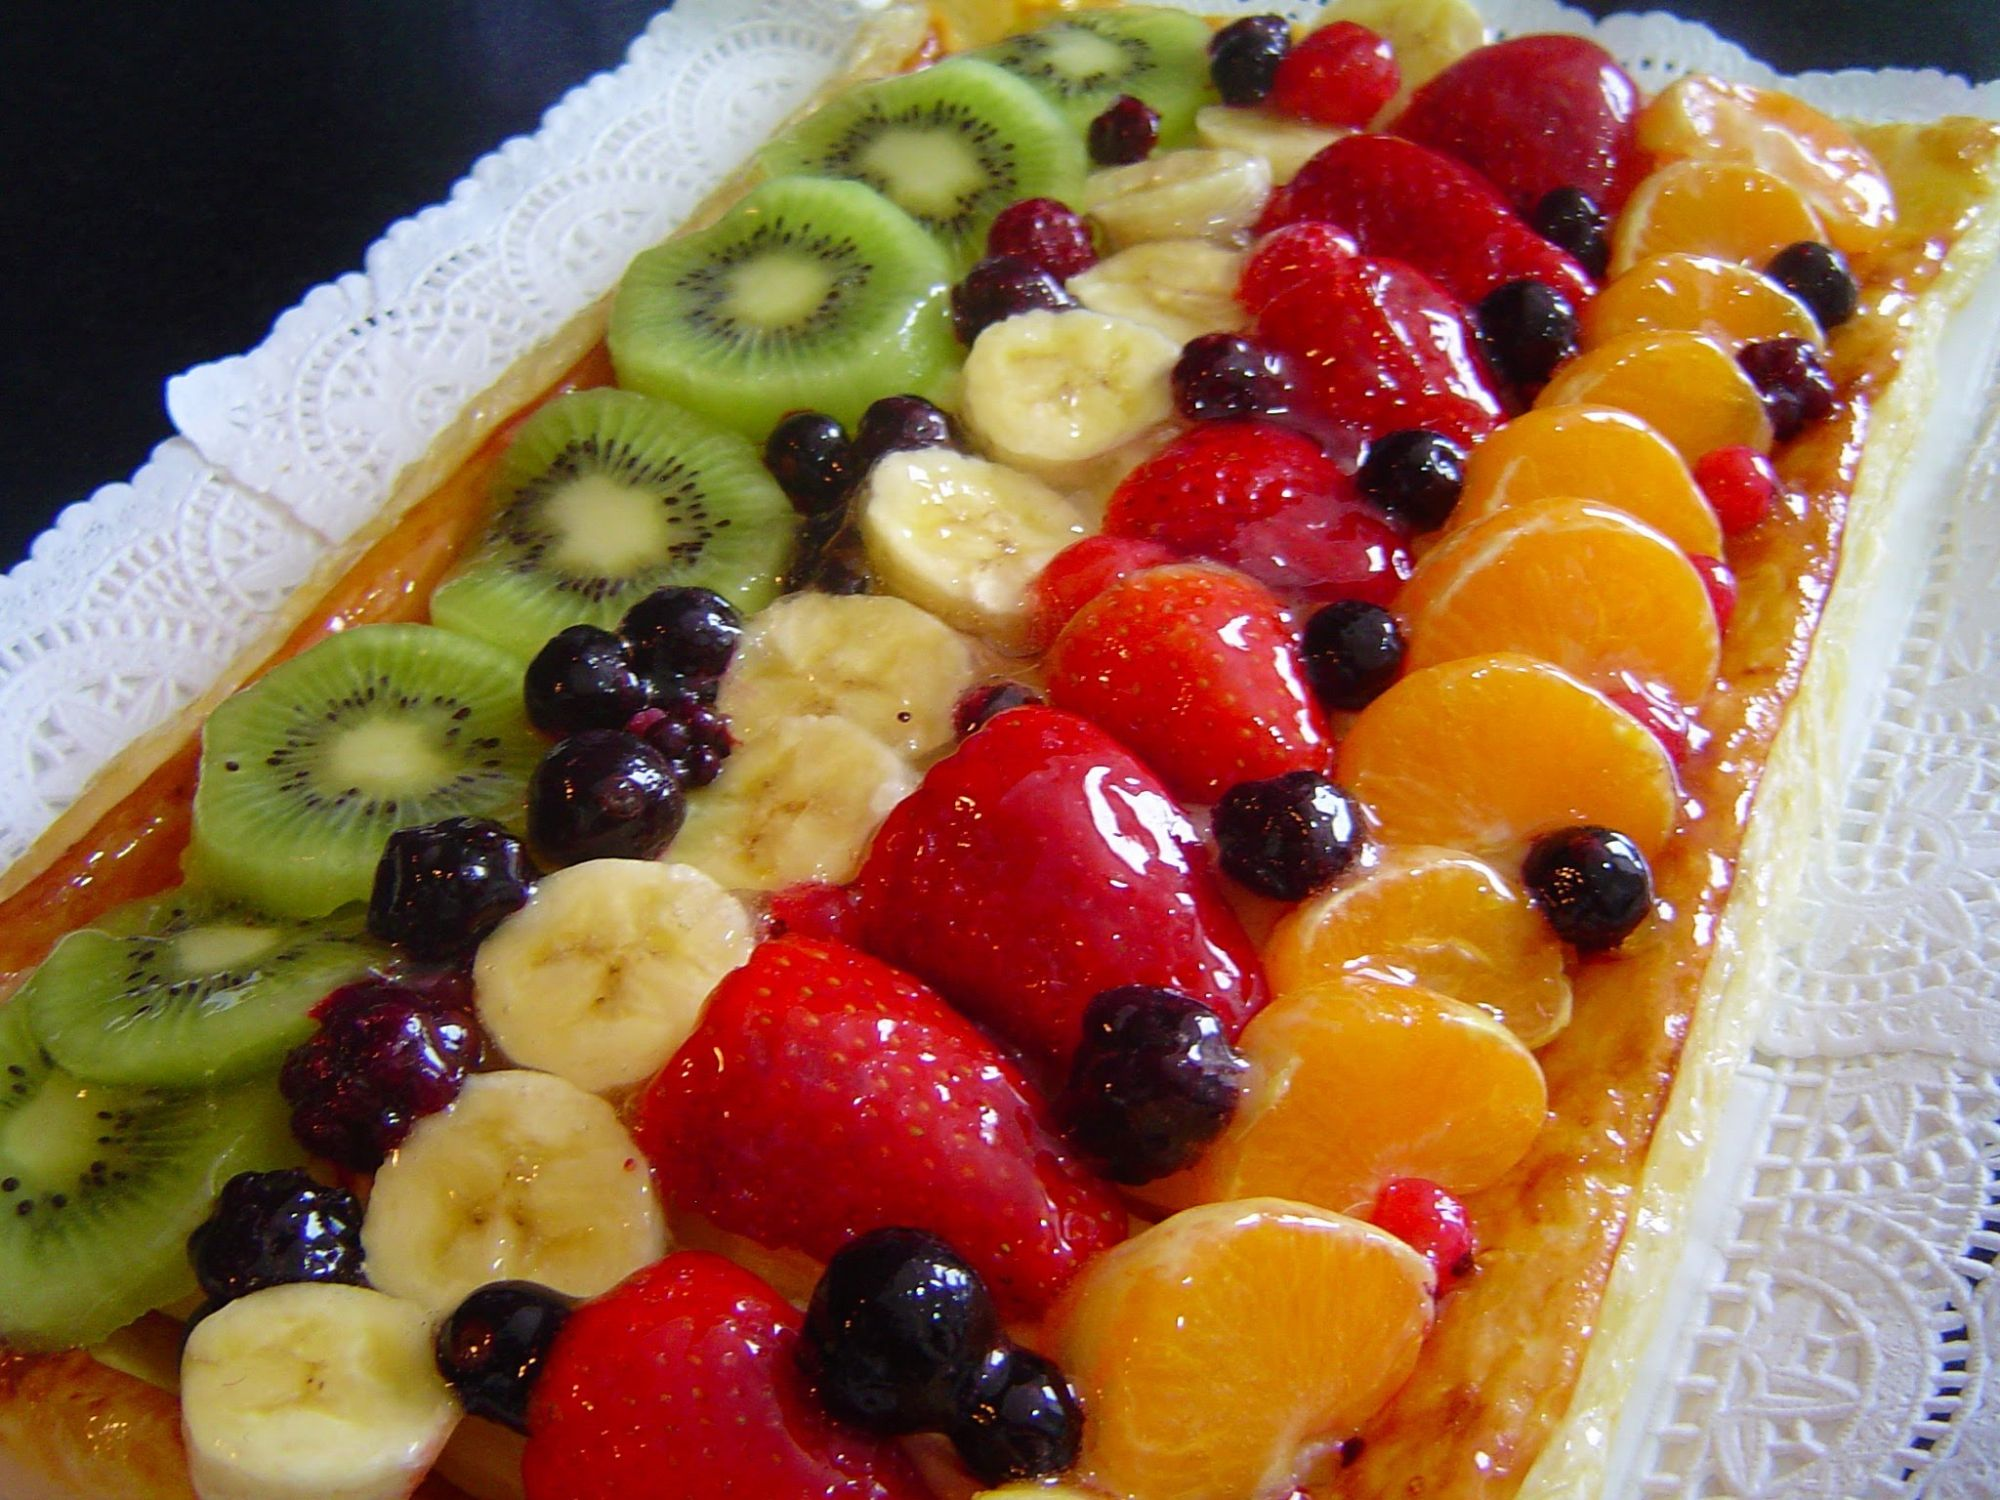 Tarta de hojaldre con frutas 4 5 - Postres con fresas naturales ...